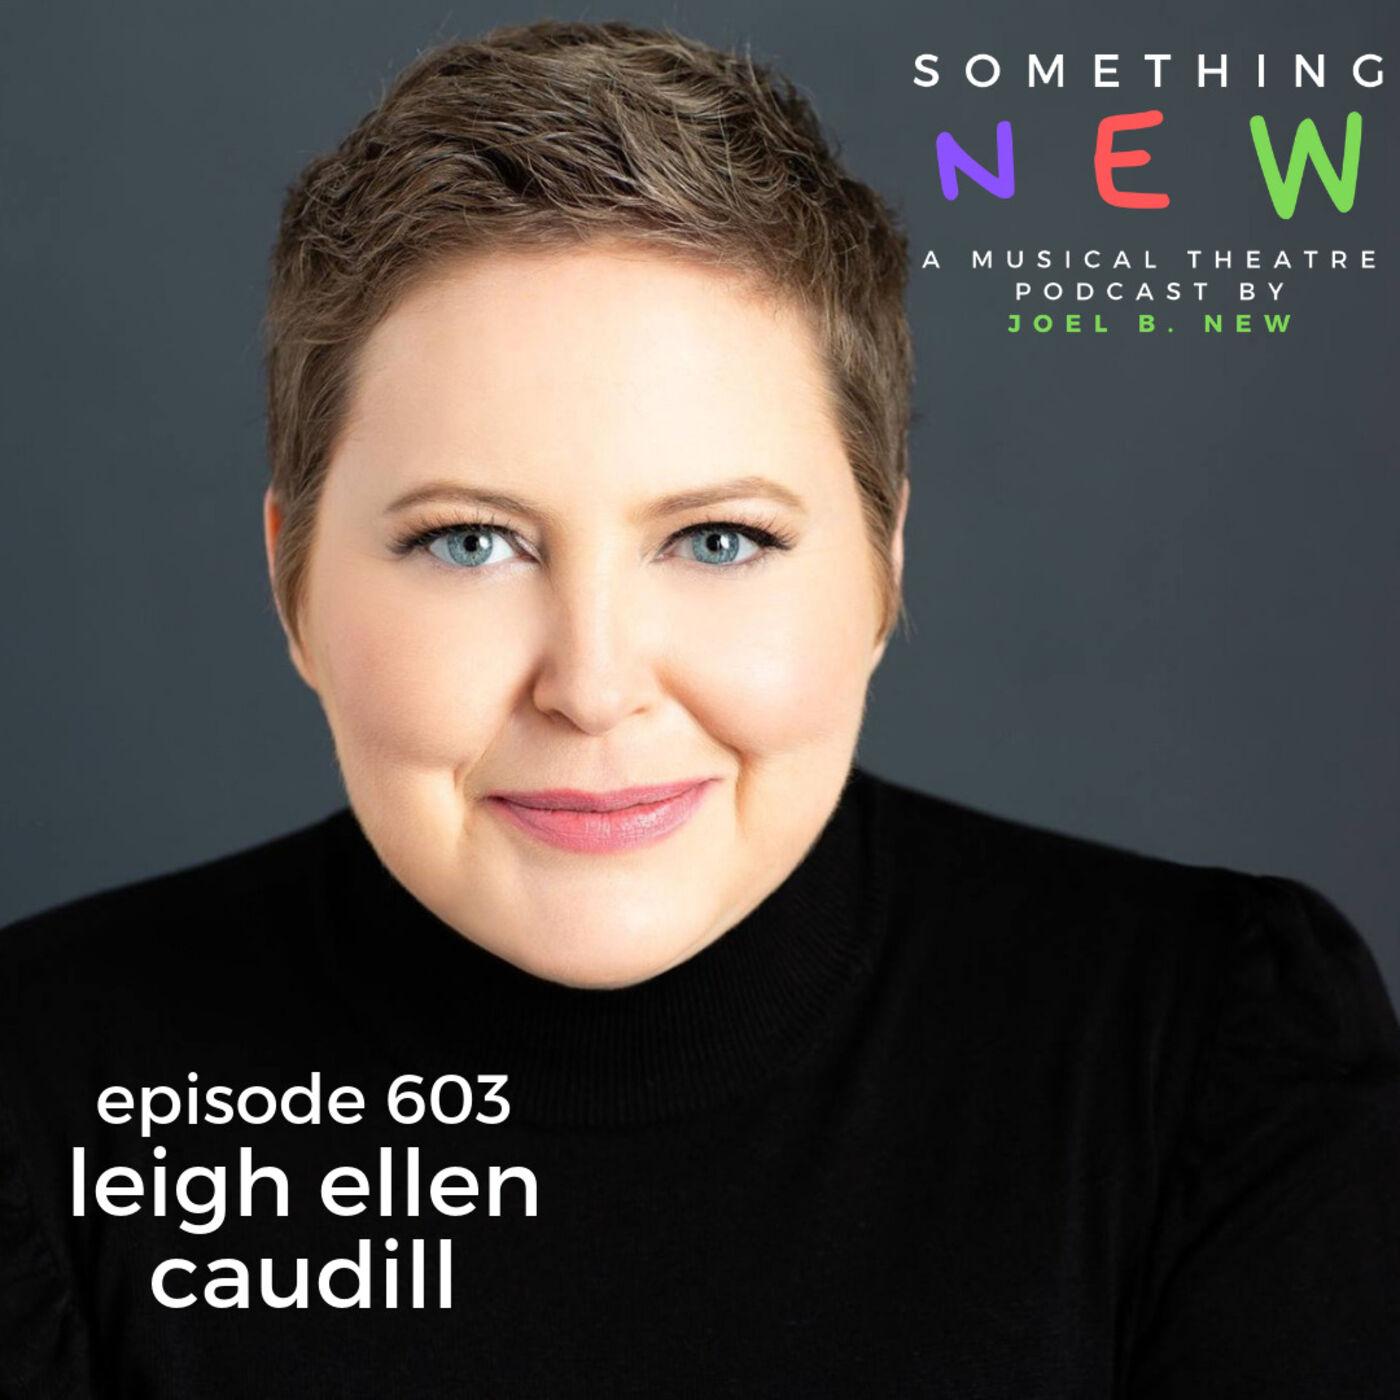 Episode 603 -- Leigh Ellen Caudill: Unleashed!